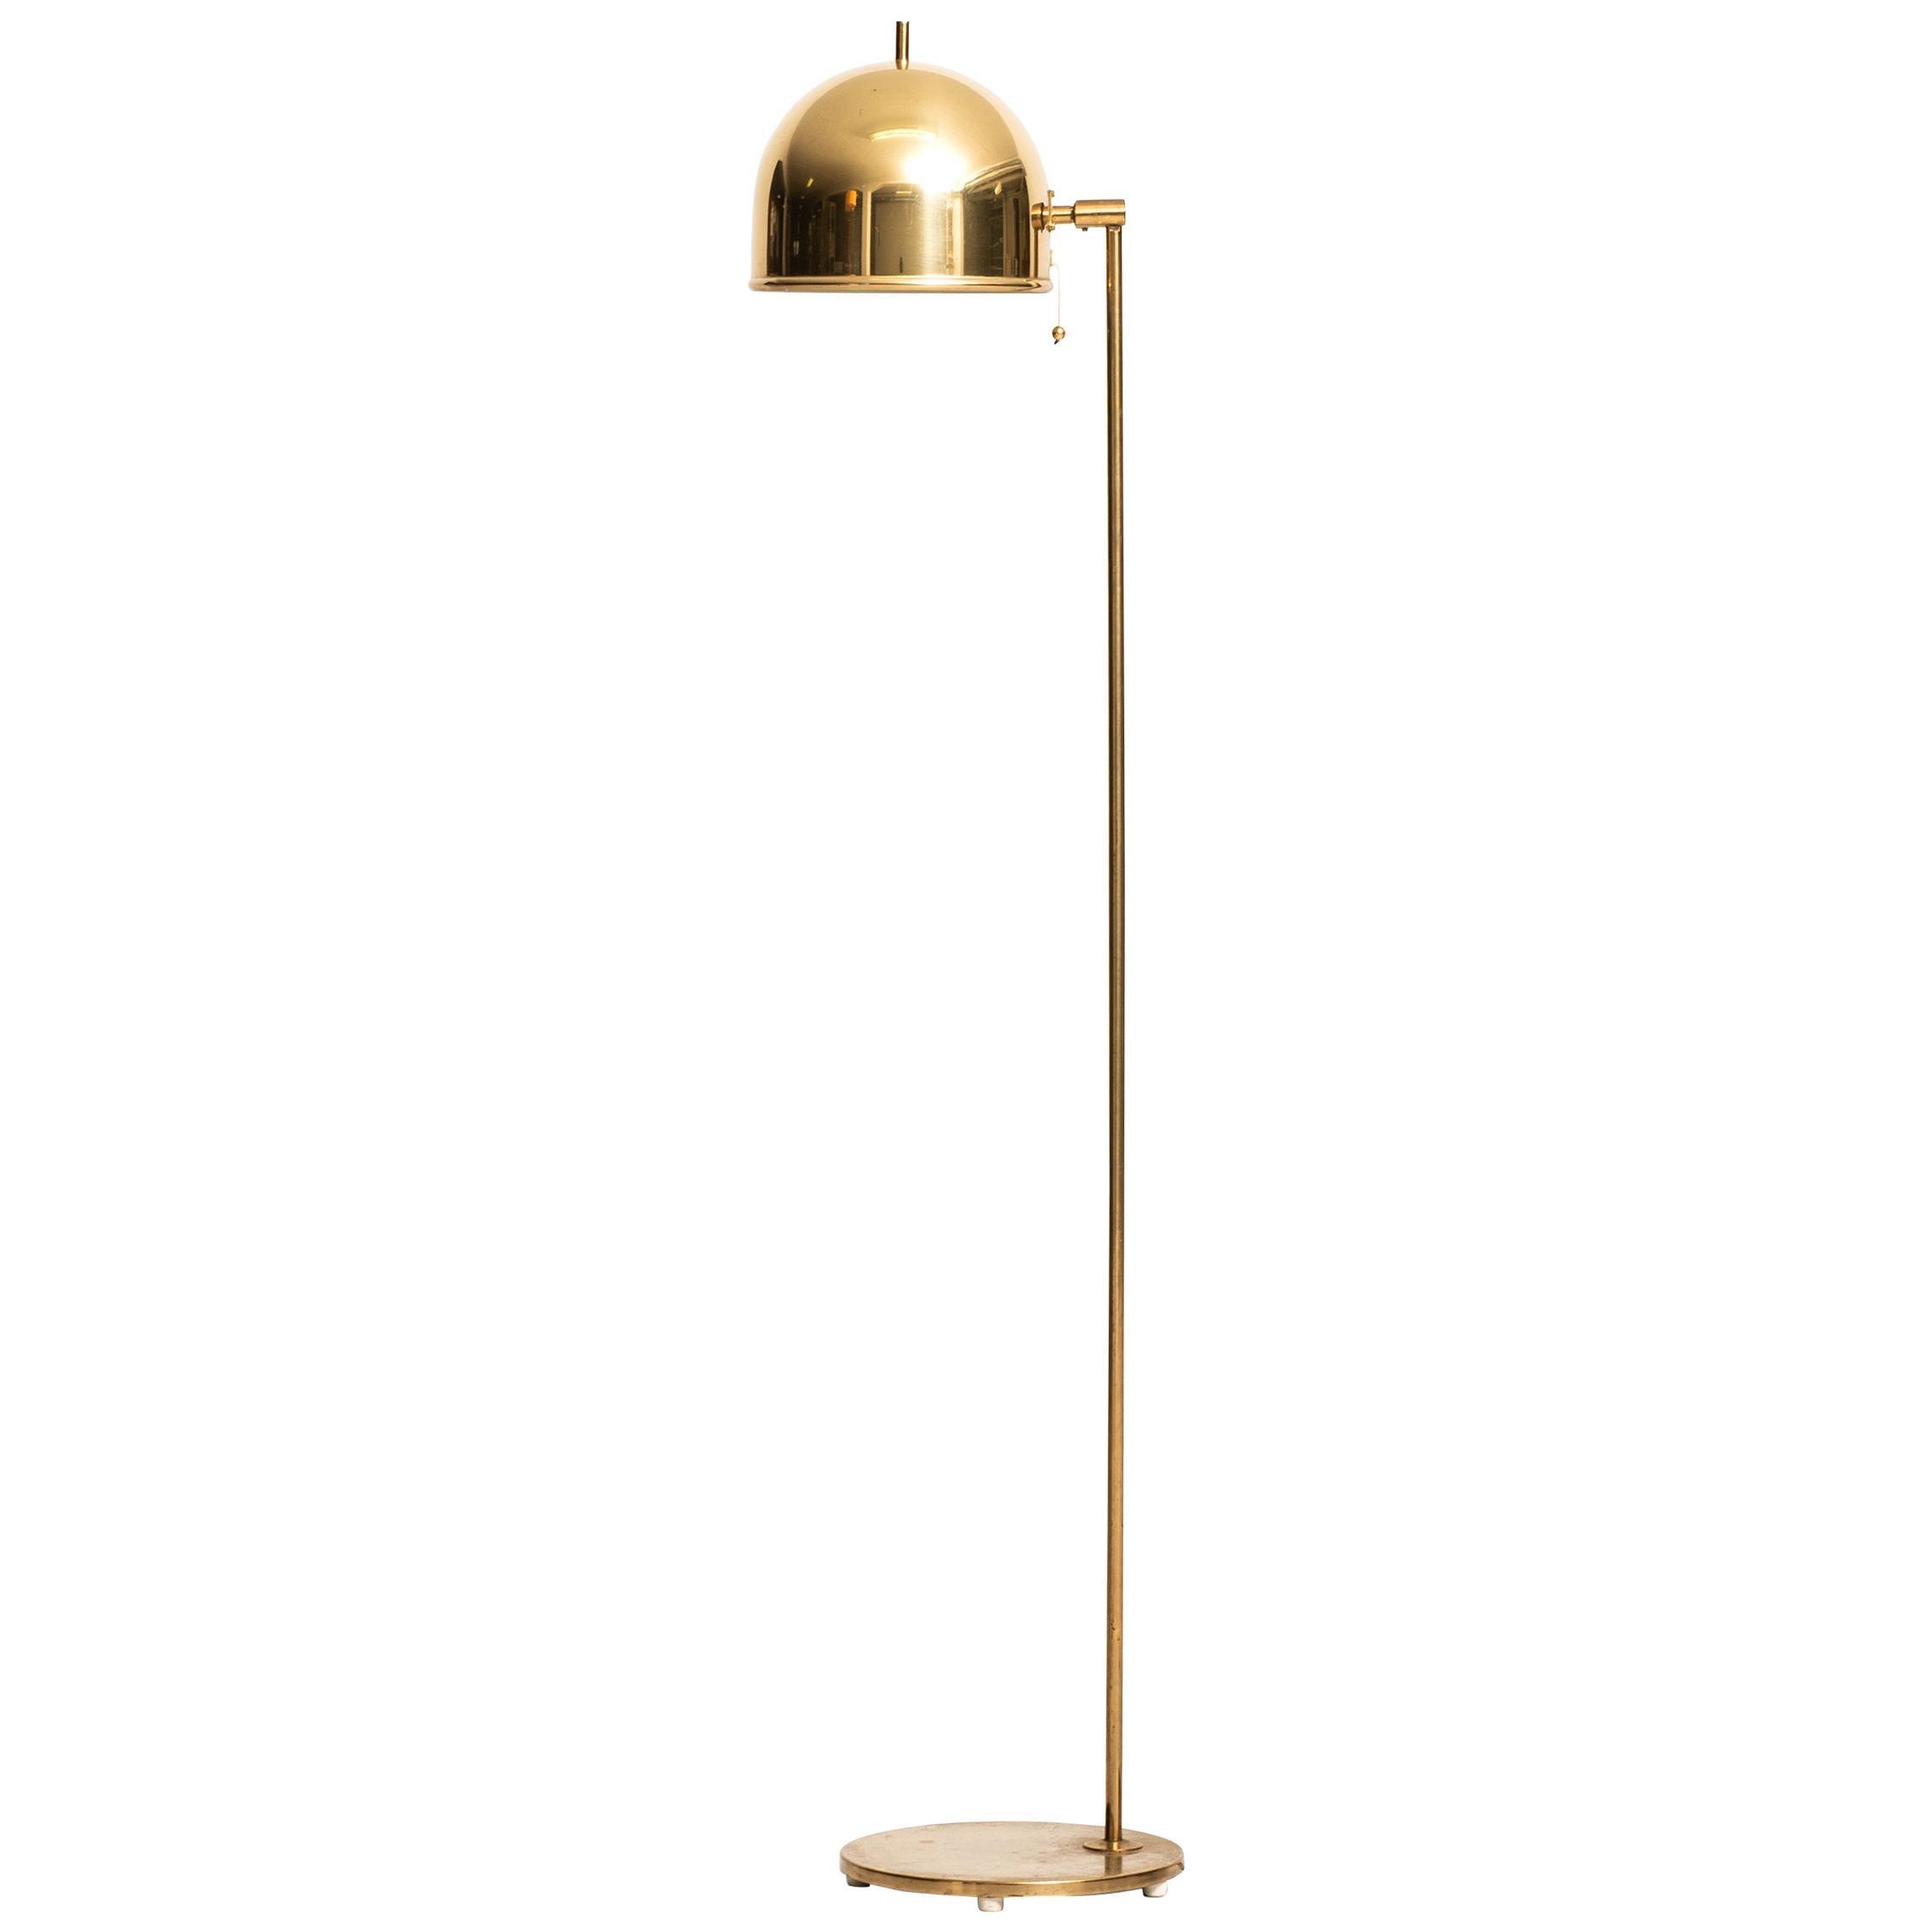 Floor Lamp Model G-075 Produced by Bergbom in Sweden